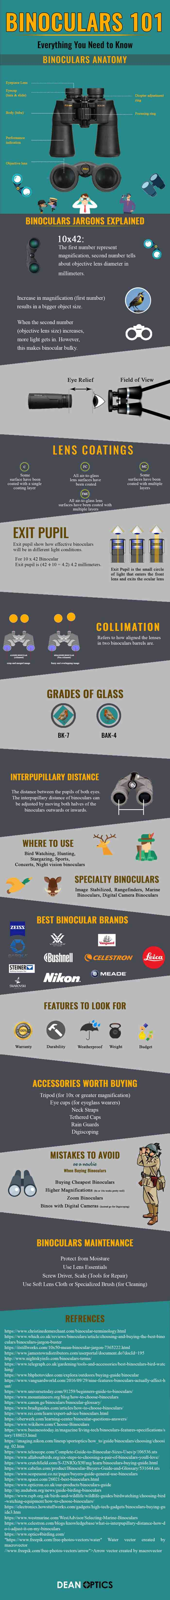 How to choose binoculars infographic